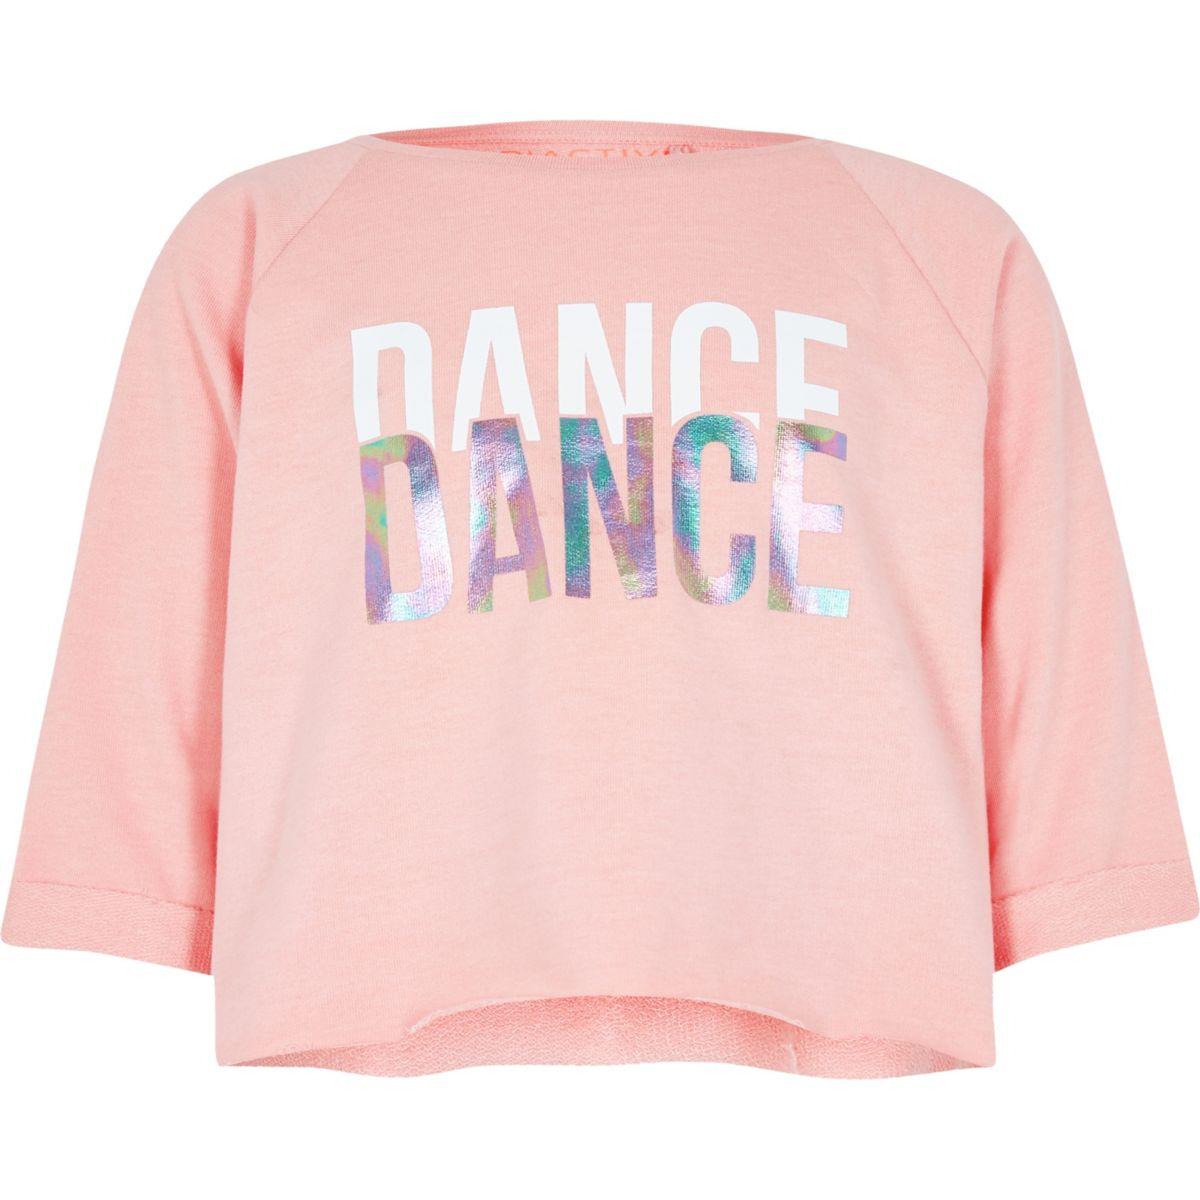 Girls light pink 'dance' crop sweatshirt